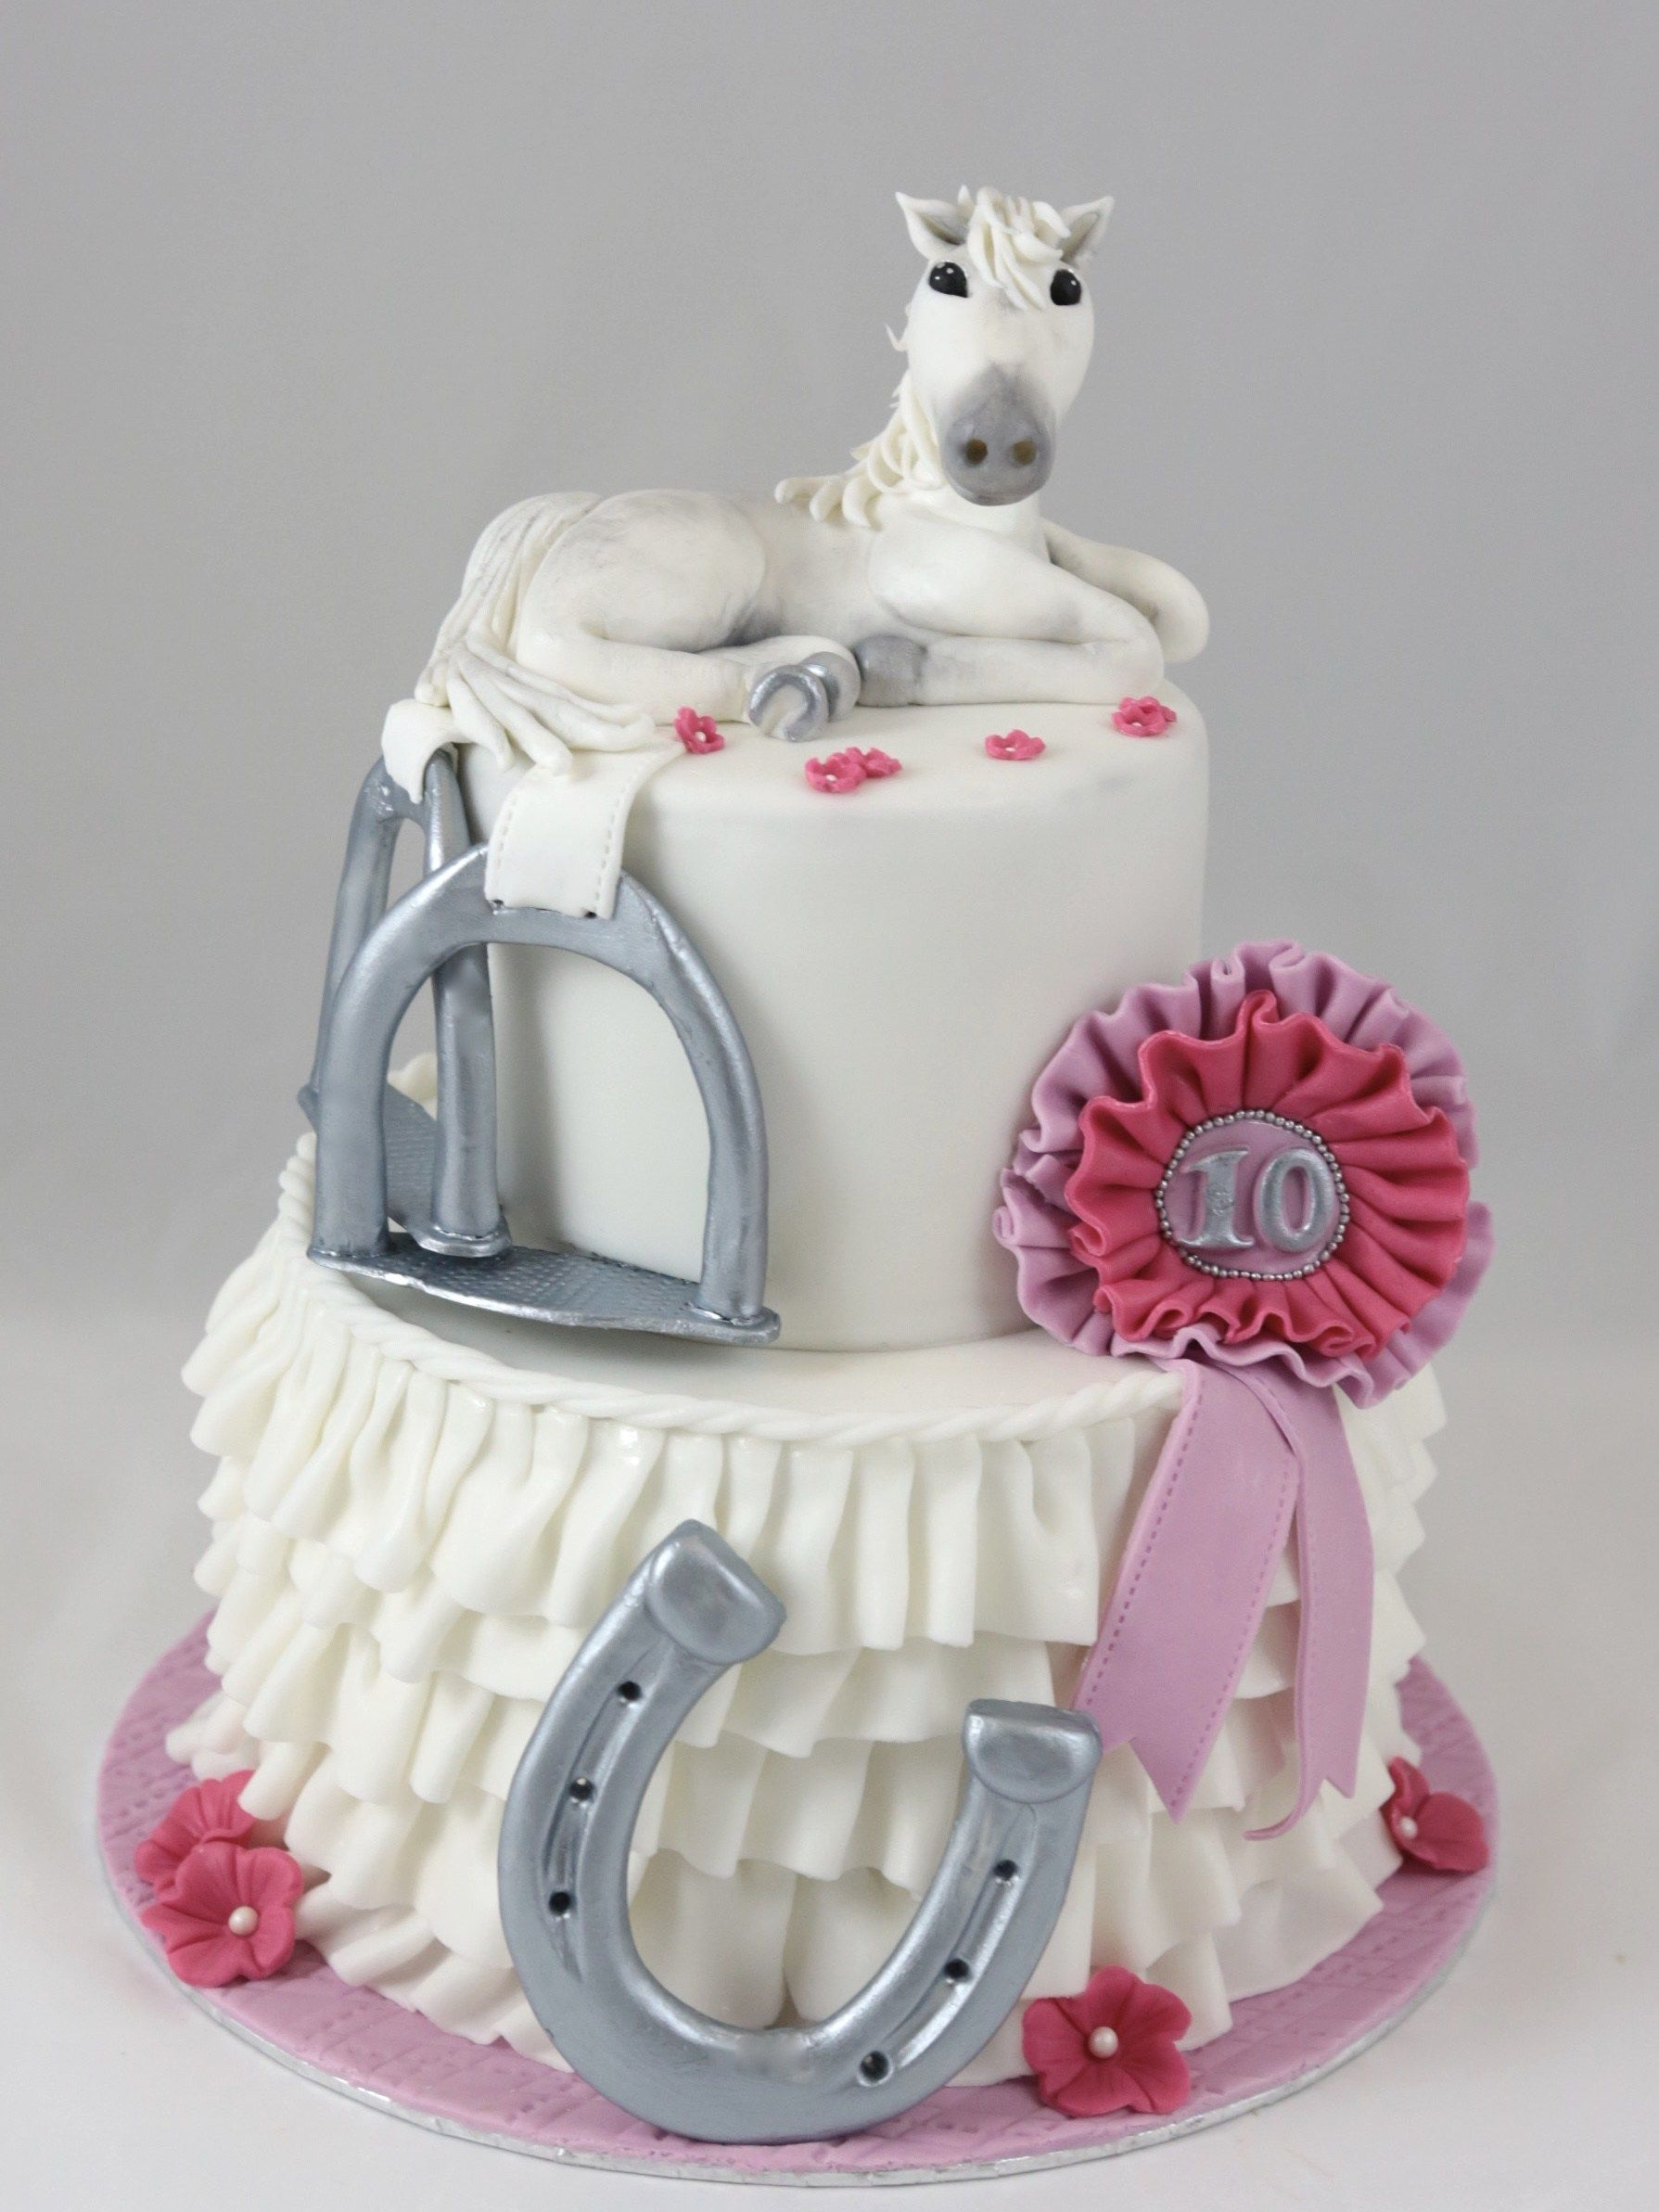 pferd horse cake fondant girl birthday m dchen geburtstag torte kindergeburtstag in 2019. Black Bedroom Furniture Sets. Home Design Ideas